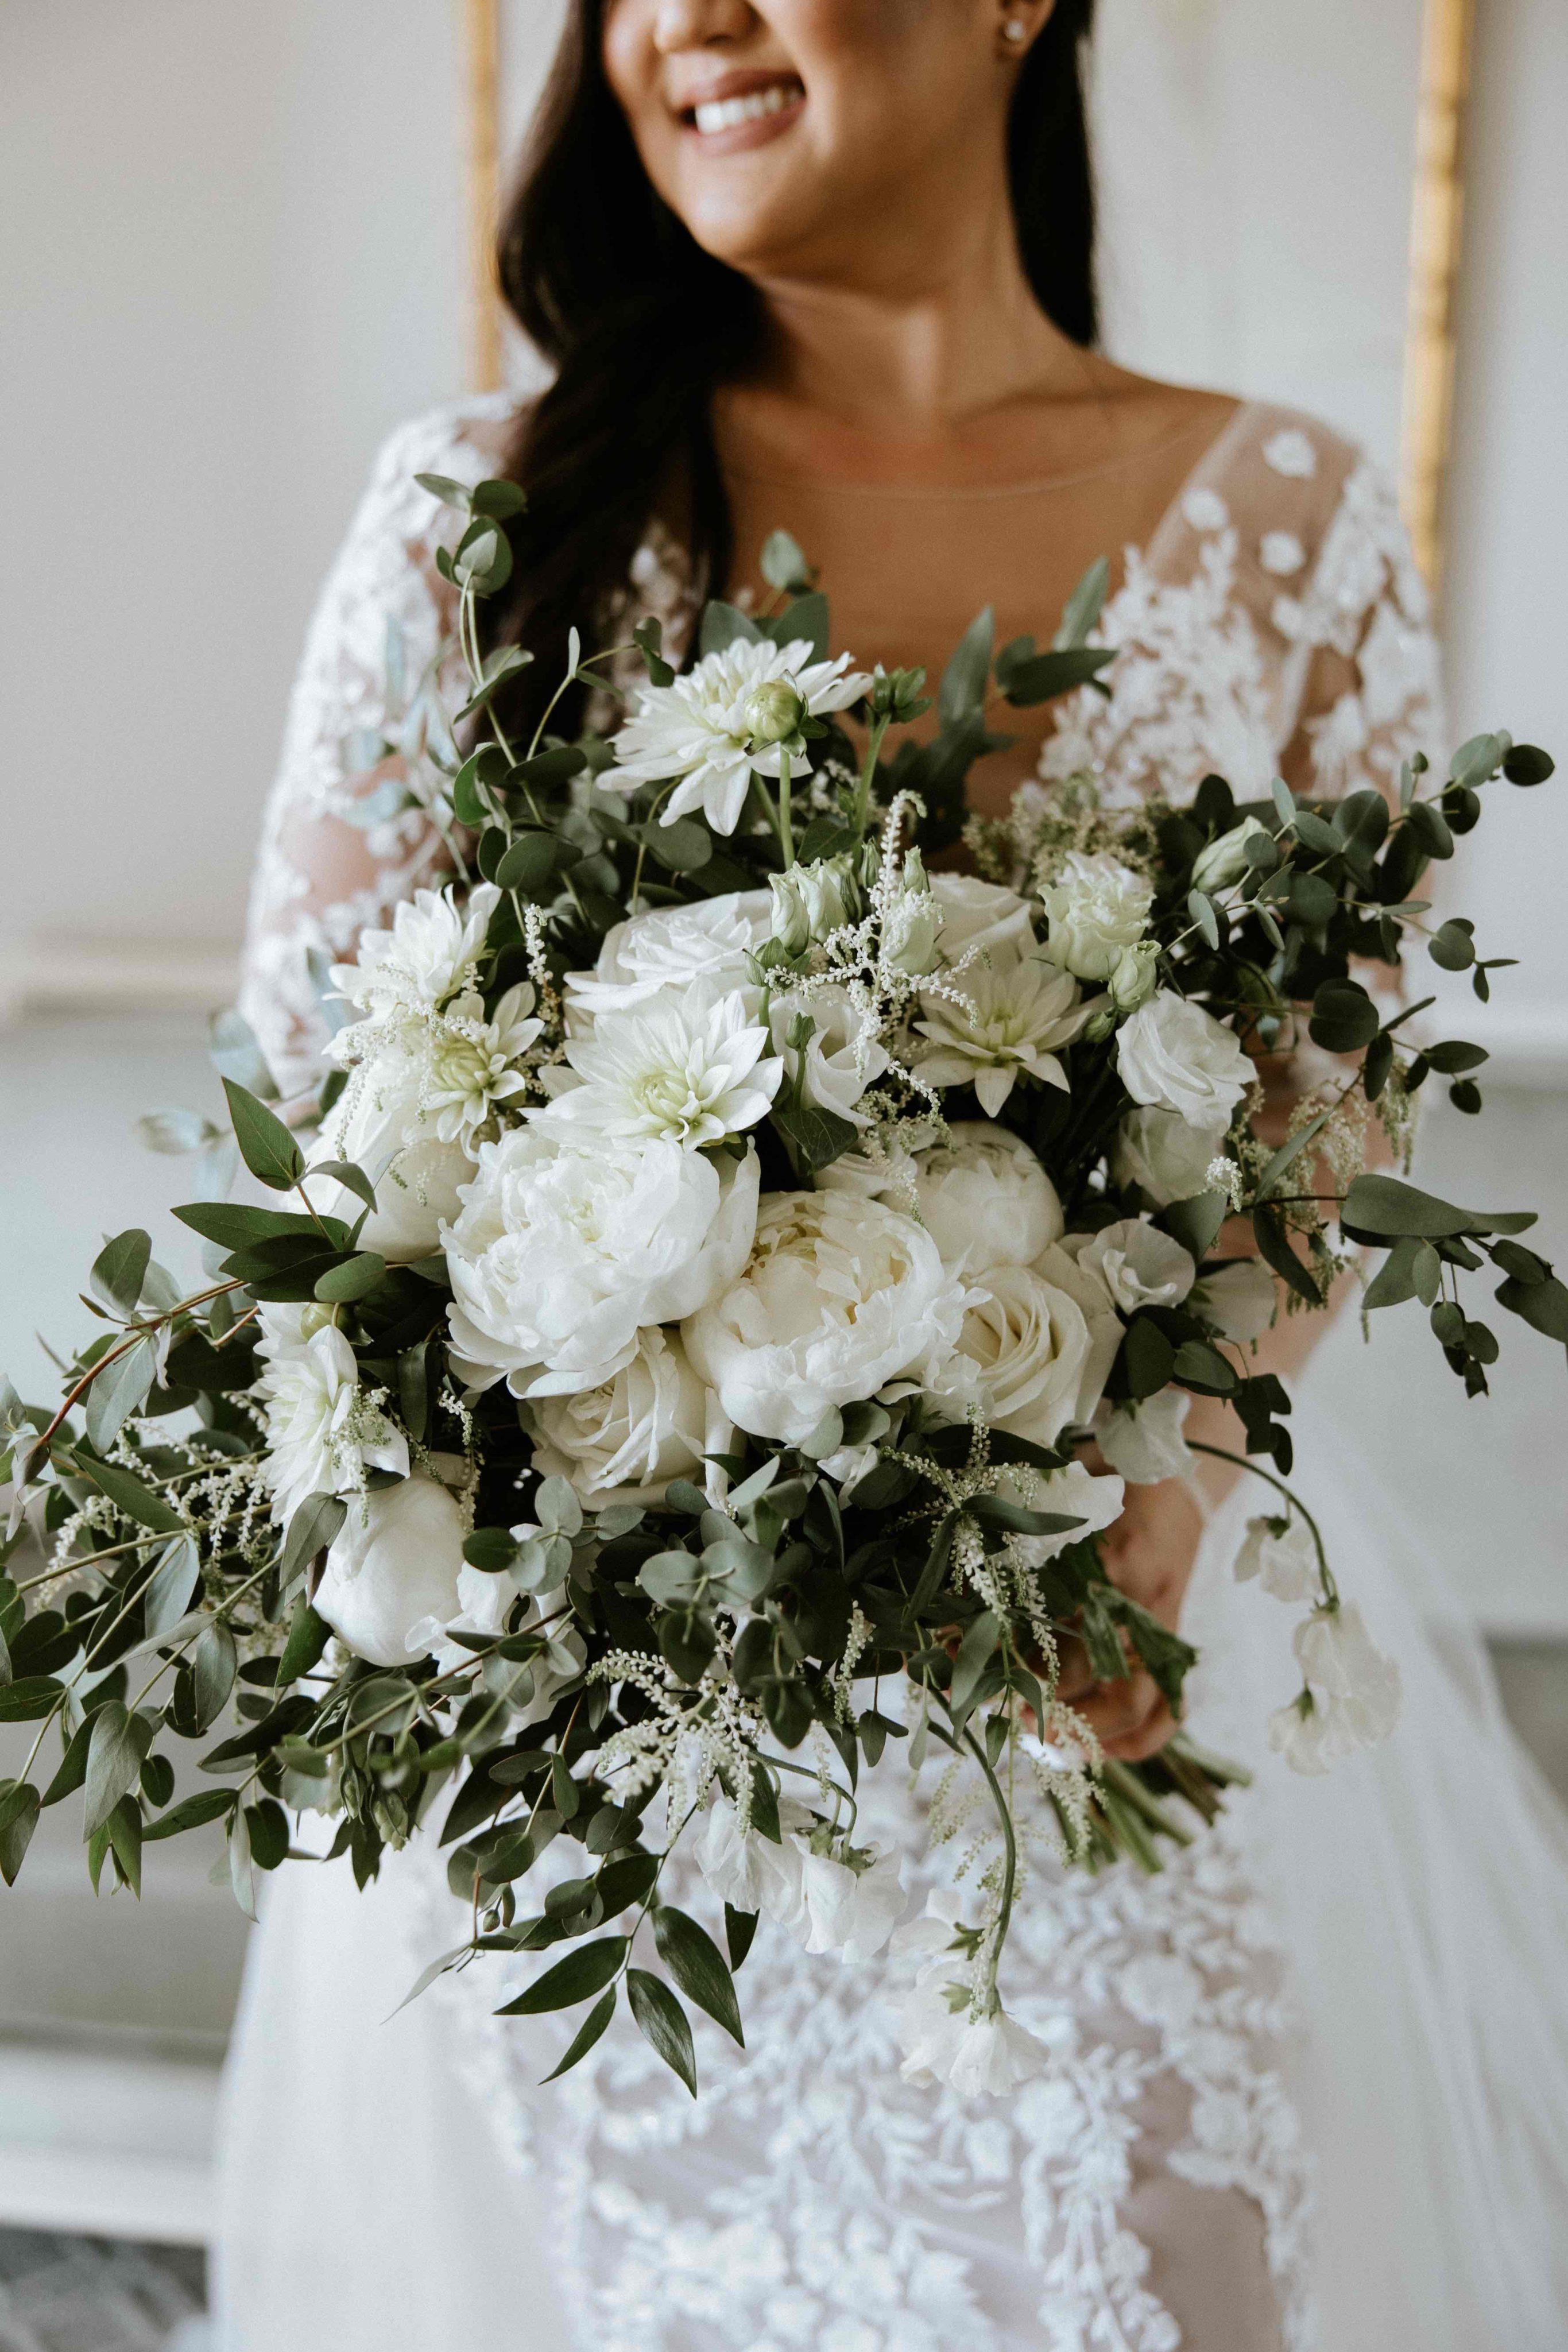 Bride holding her floral bouquet